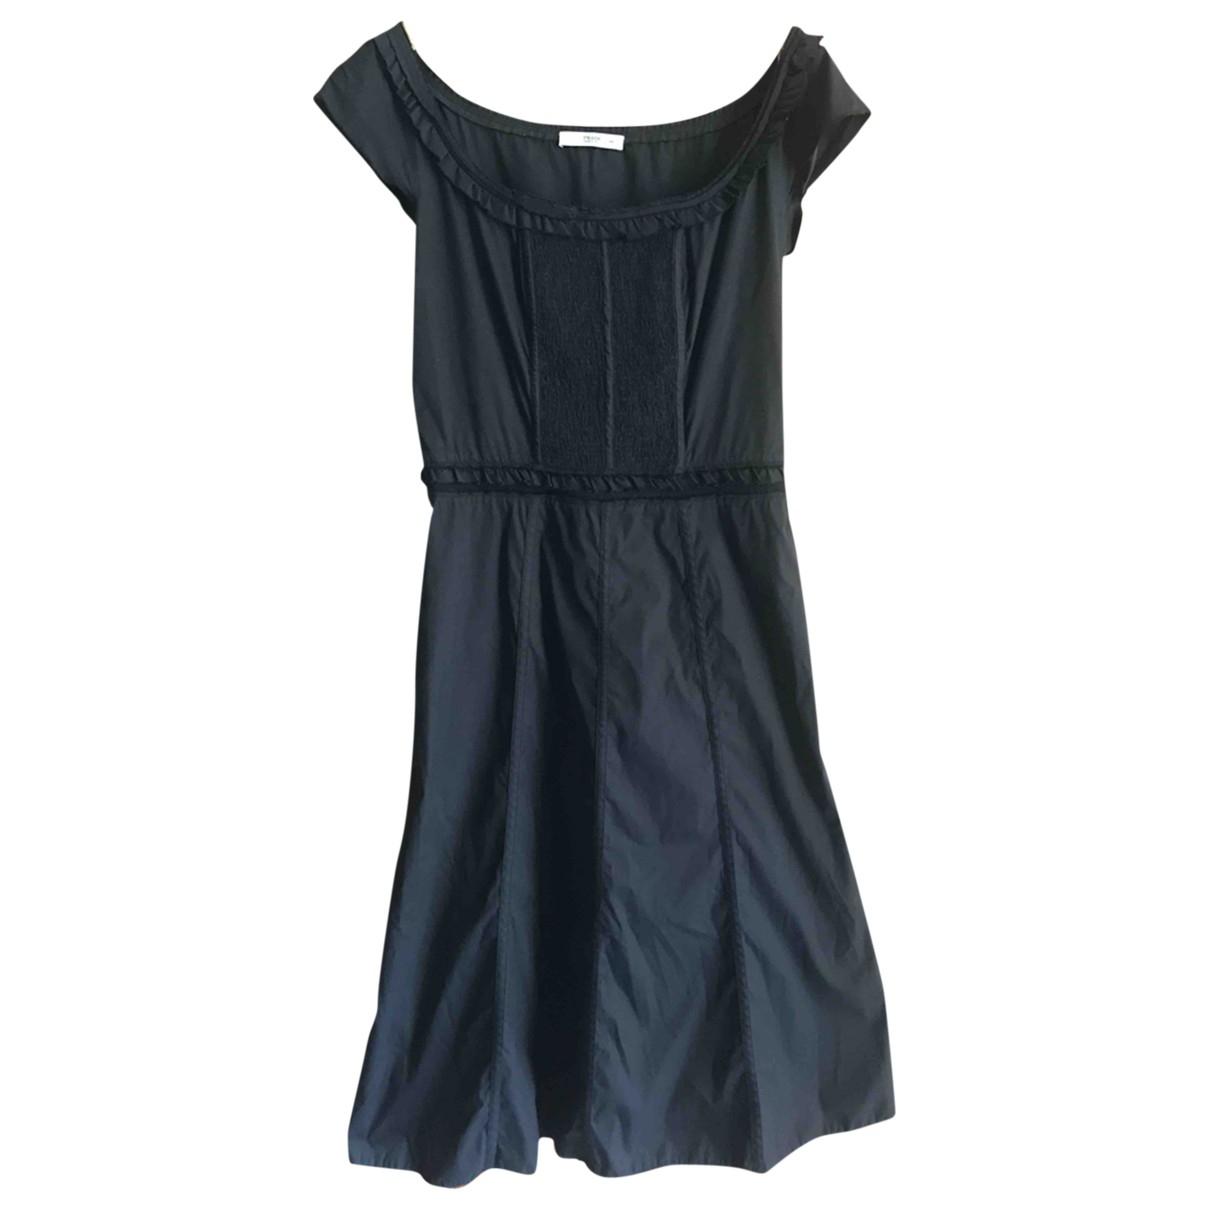 Prada \N Black Cotton dress for Women 44 IT